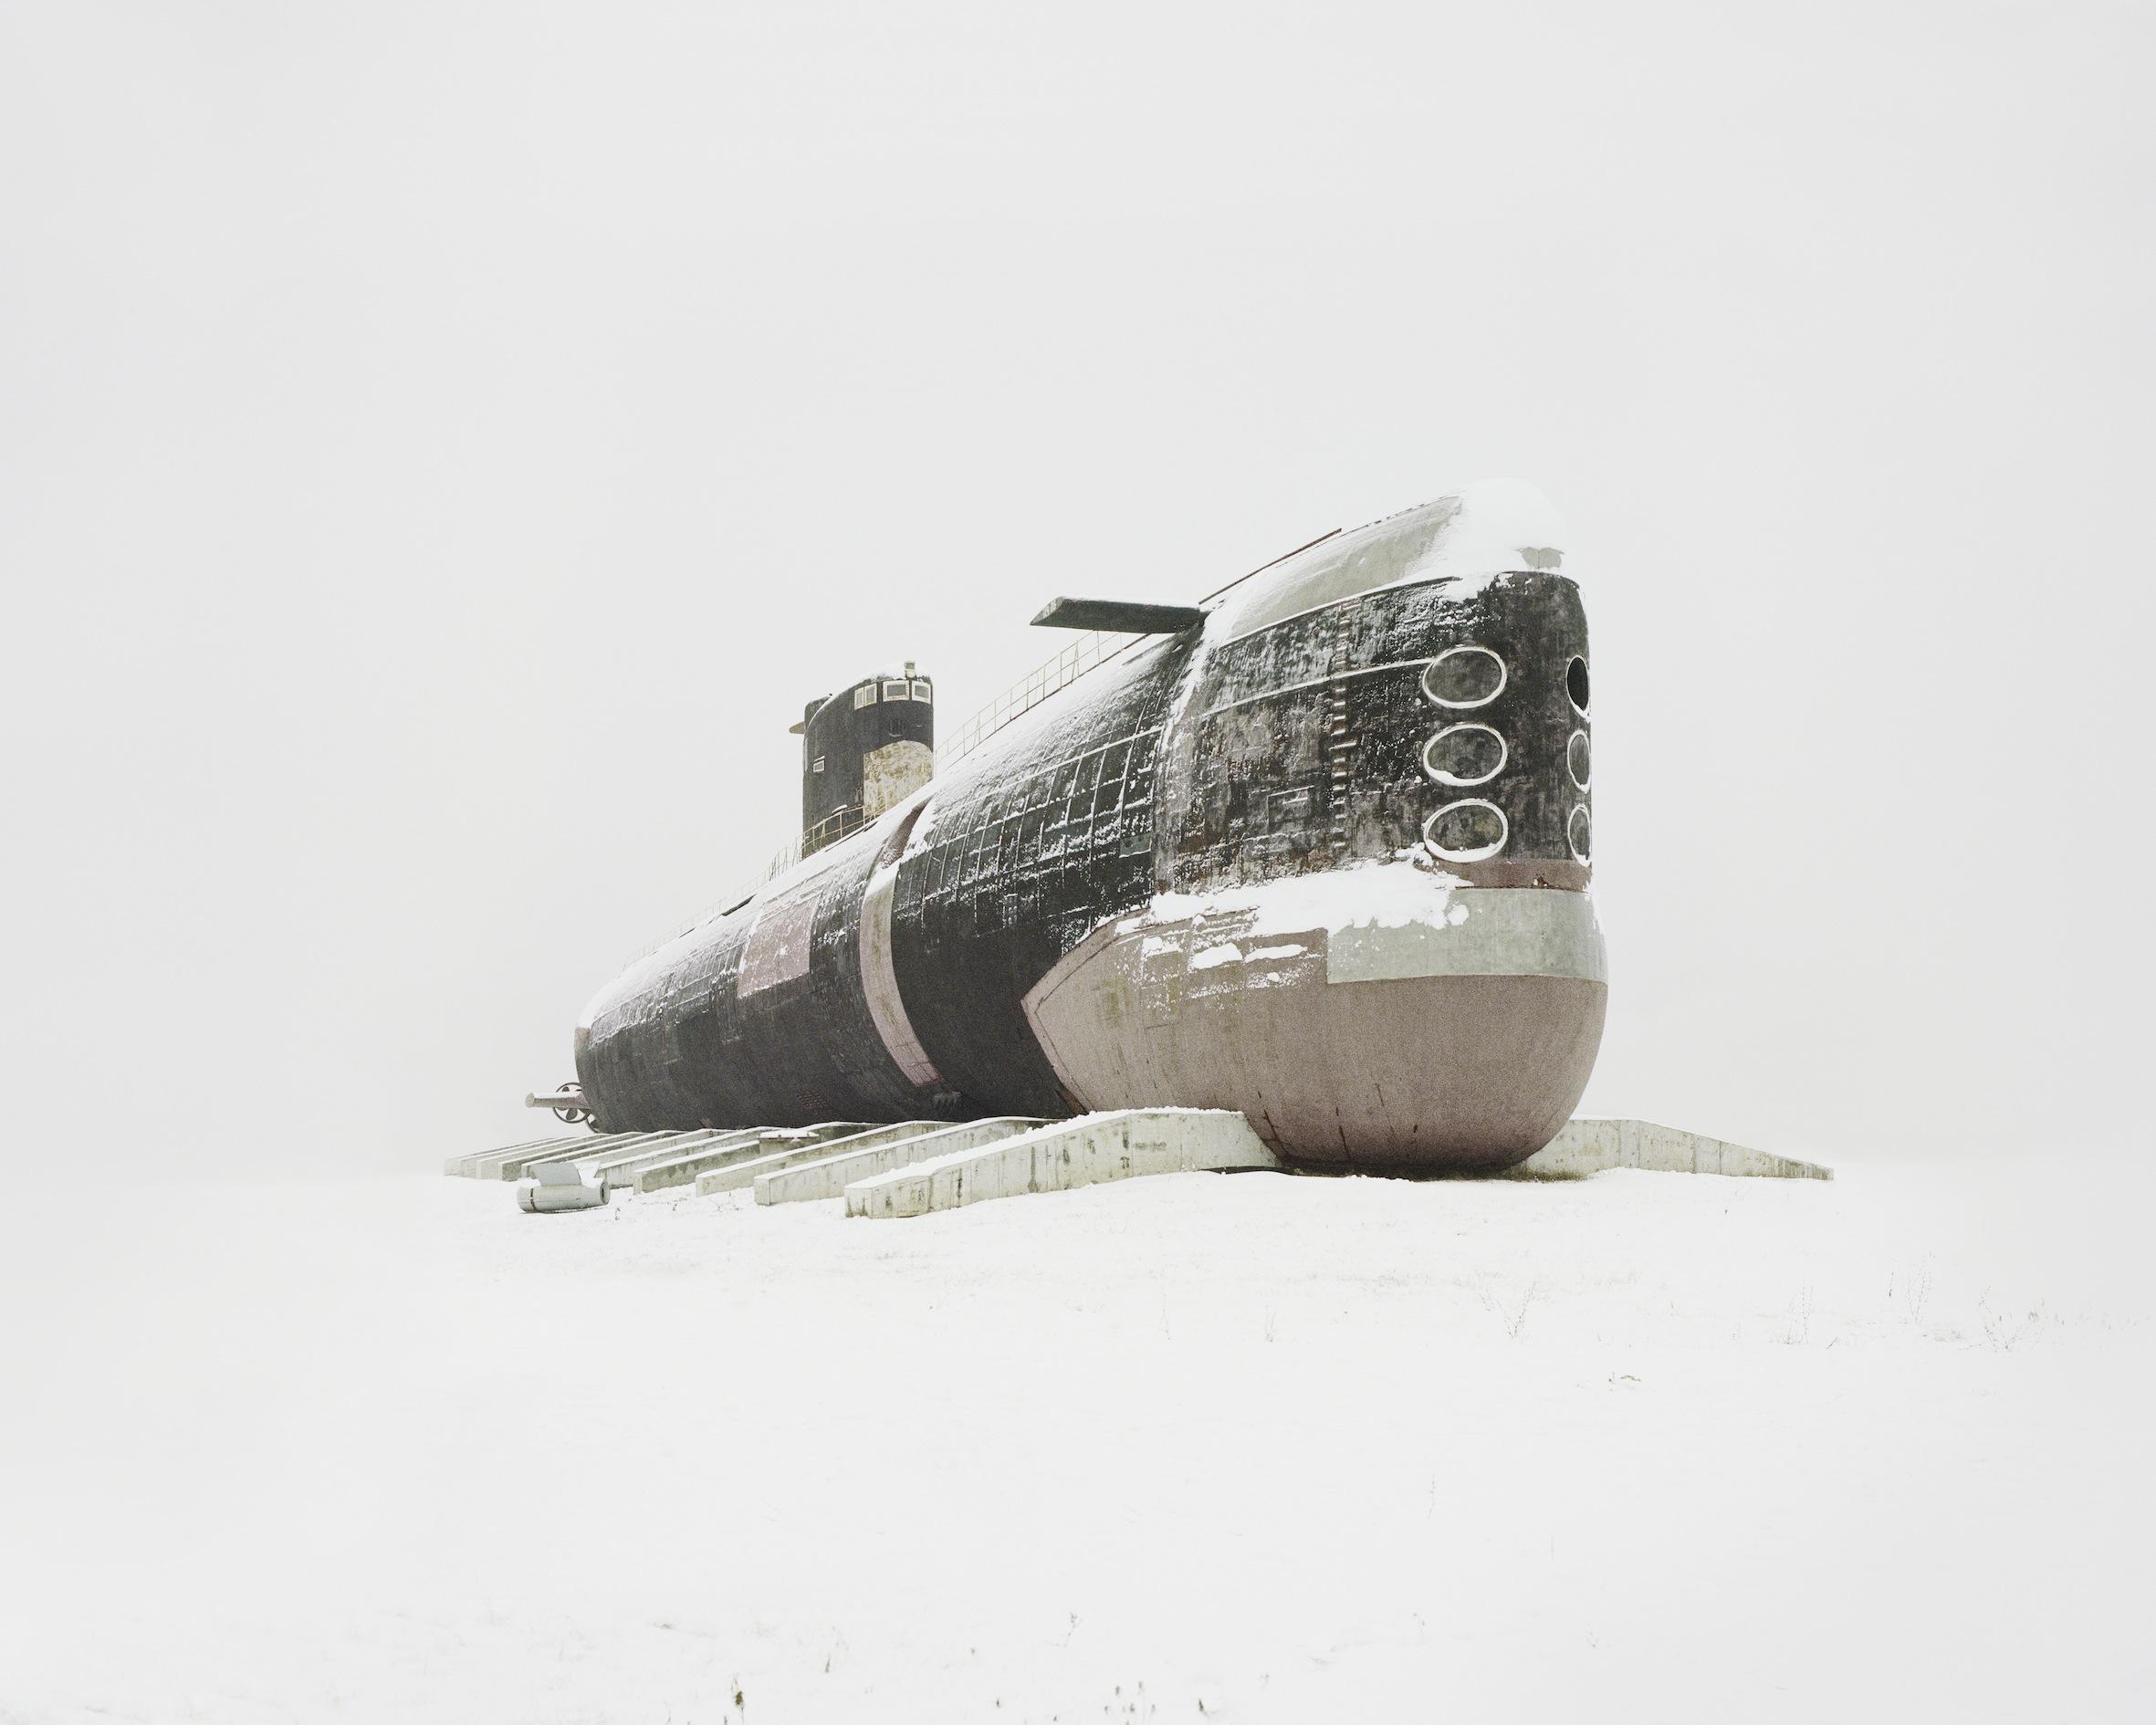 One of the world's largest diesel submarines. Russia, Samara region